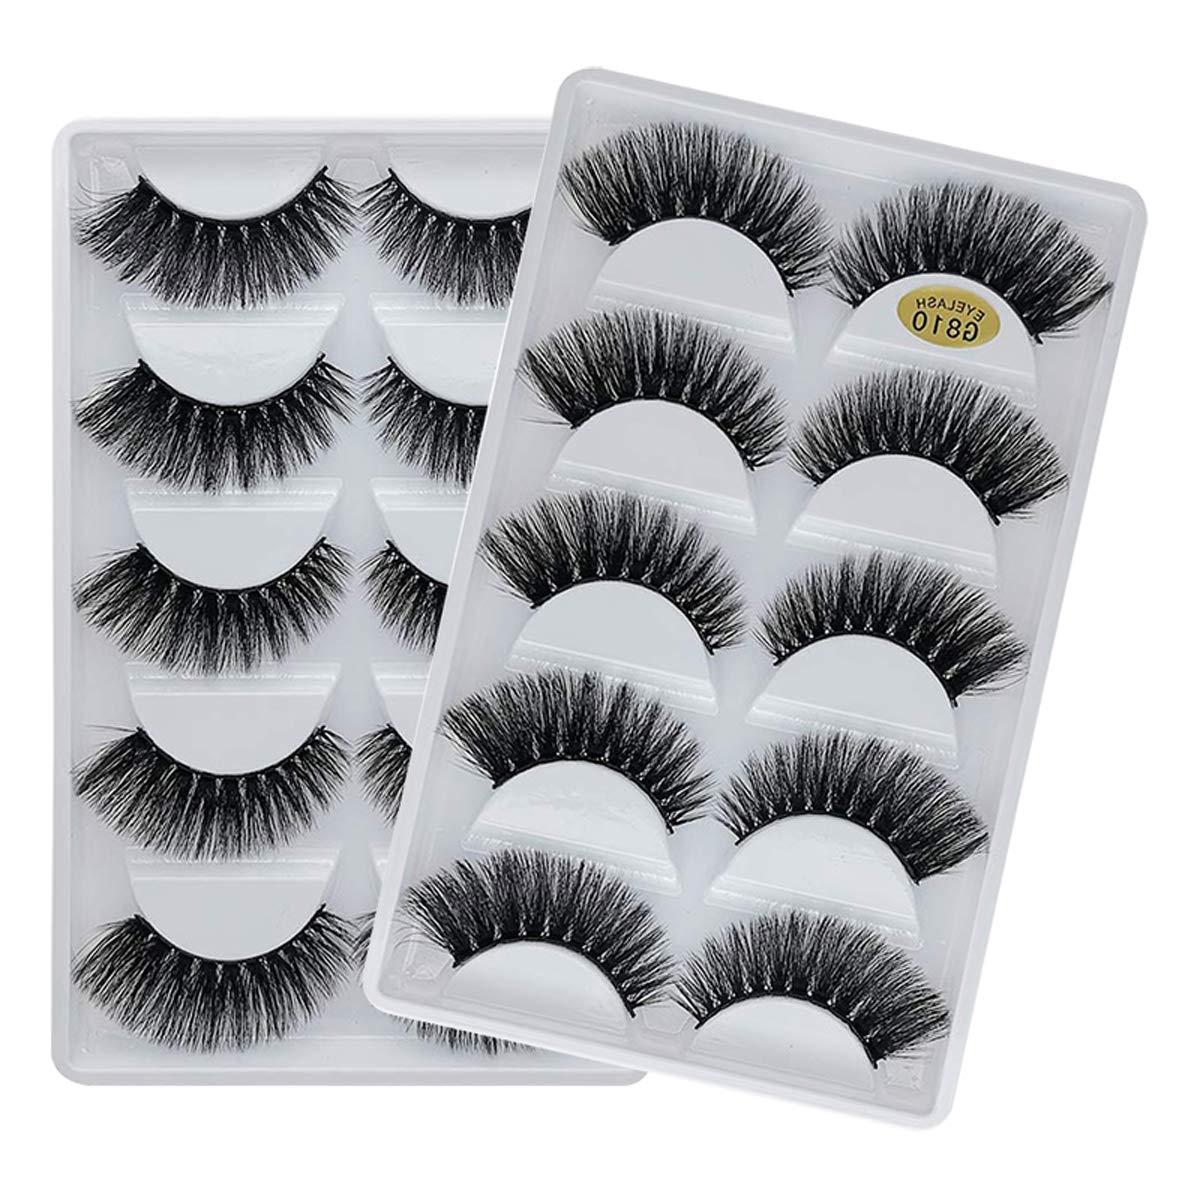 Vayator 10 Pairs/Set 3D Mink Lashes Natural False Eyelashes Dramatic Volume Fake Lashes Makeup Eyelash Extension Silk Eyelashes (G810)